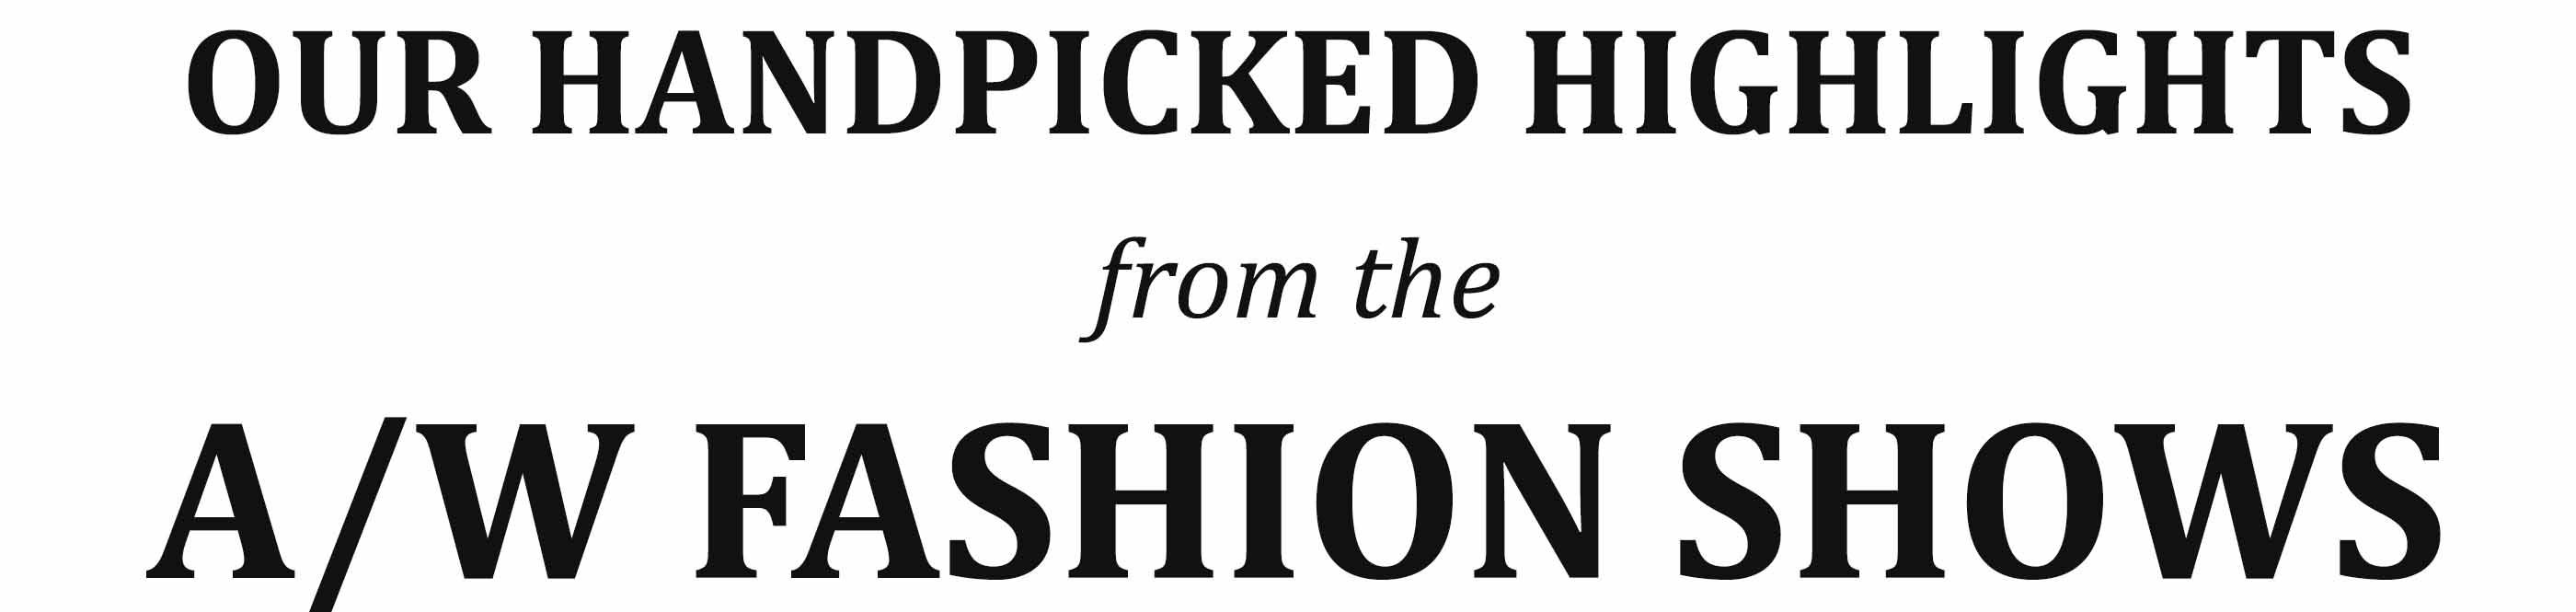 A/W Fashion Show Highlights